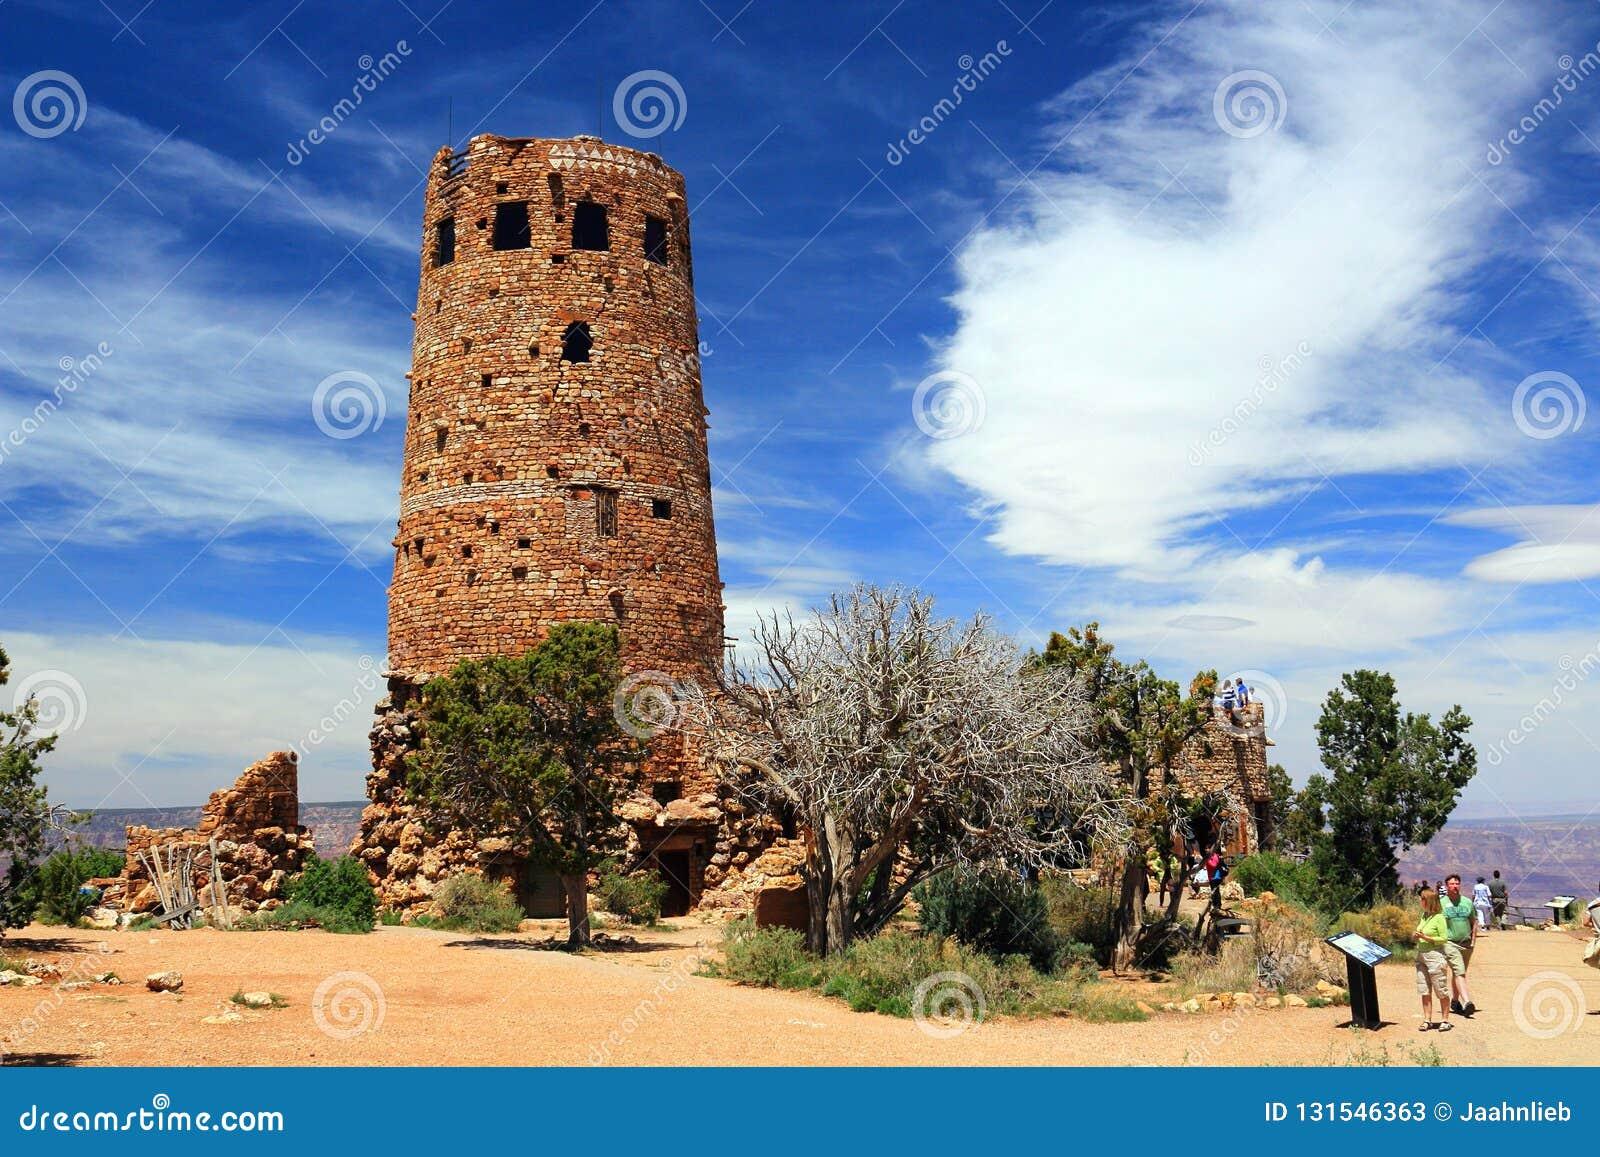 Watchtower At Desert View Grand Canyon National Park Arizona